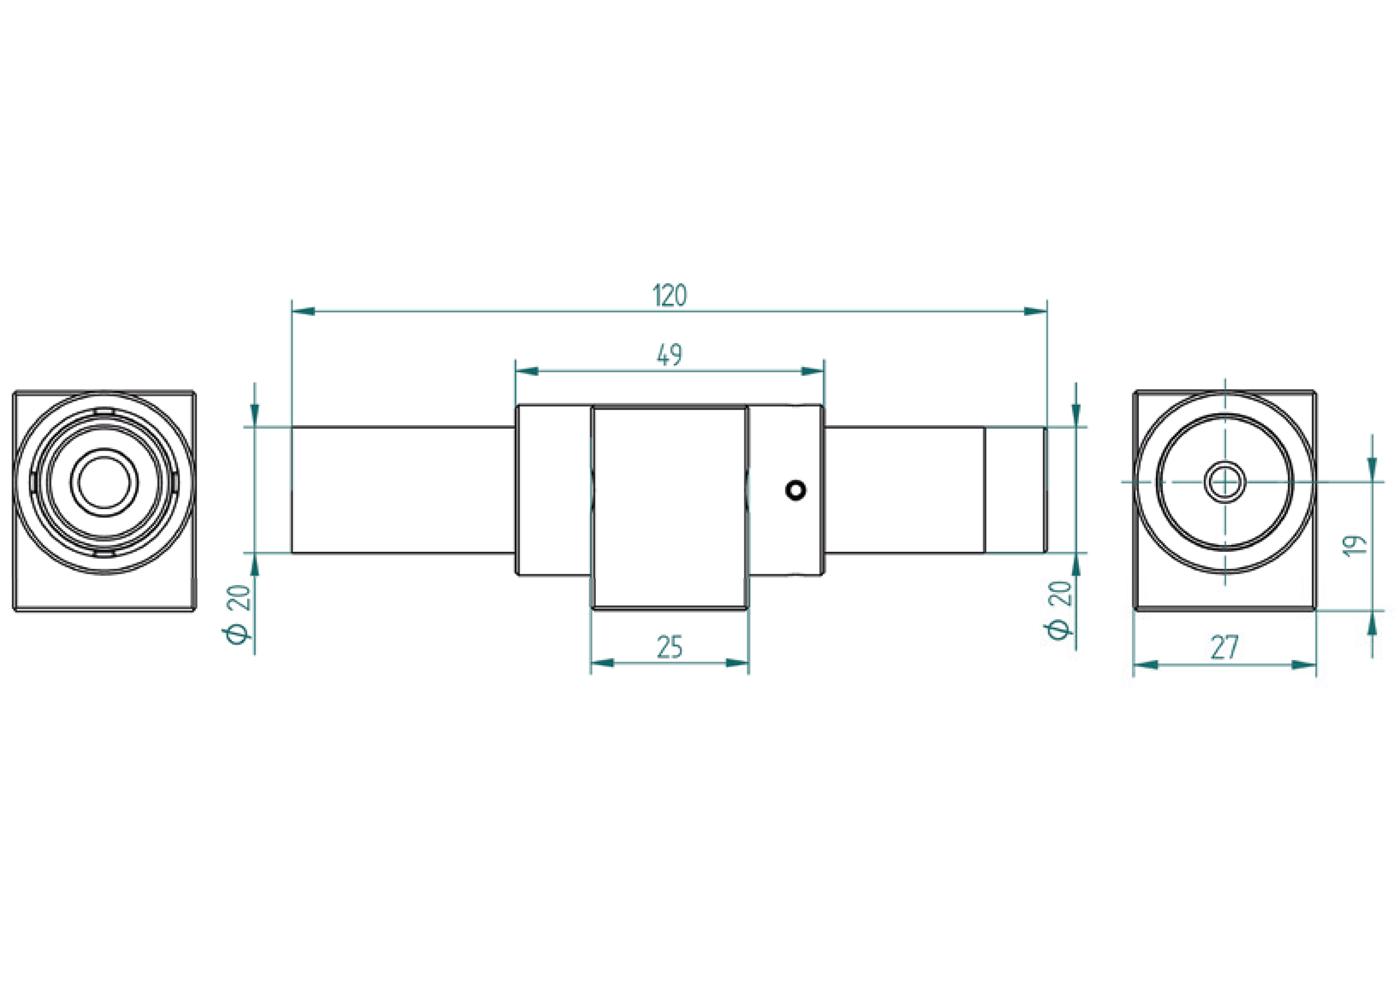 Laser Based Belt Drive Alignment Tool